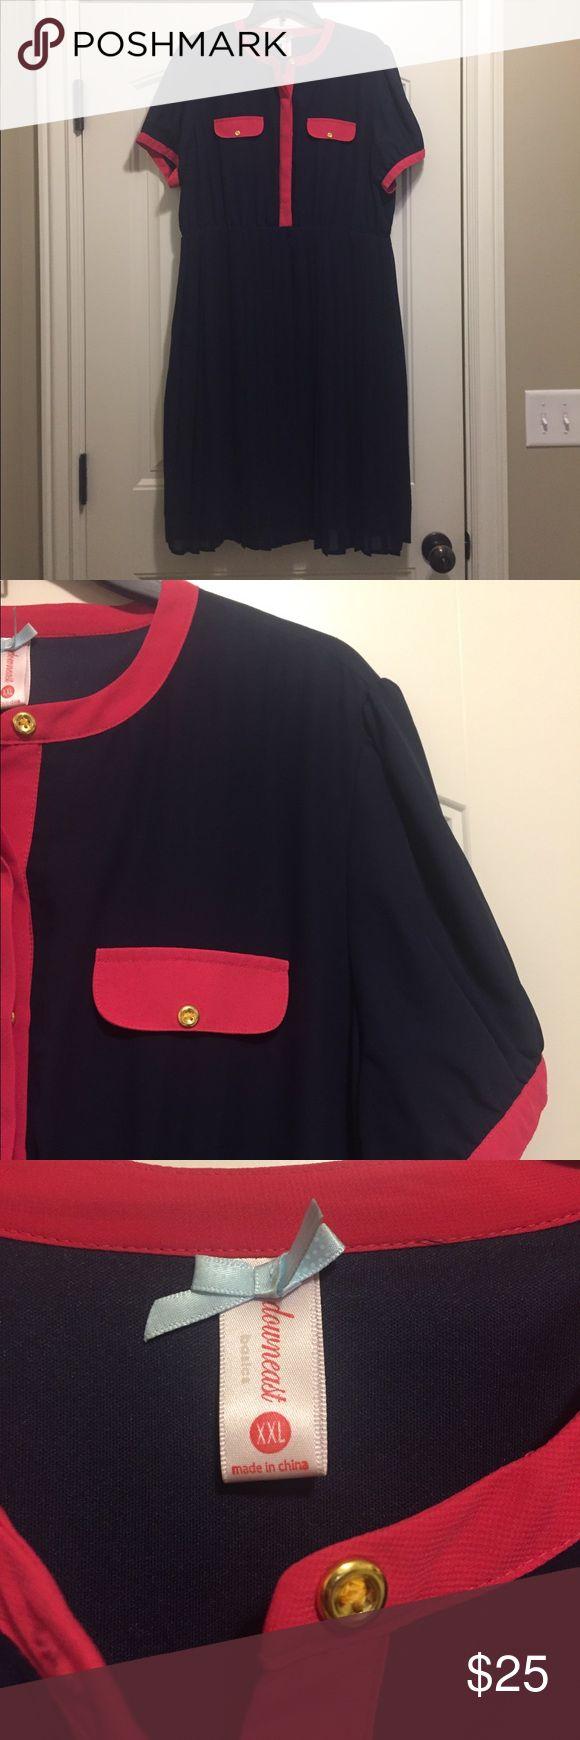 NWOT pocket front pleat skirt chiffon dress. NWOT pocket front pleat skirt chiffon dress. Downeast Dresses Midi